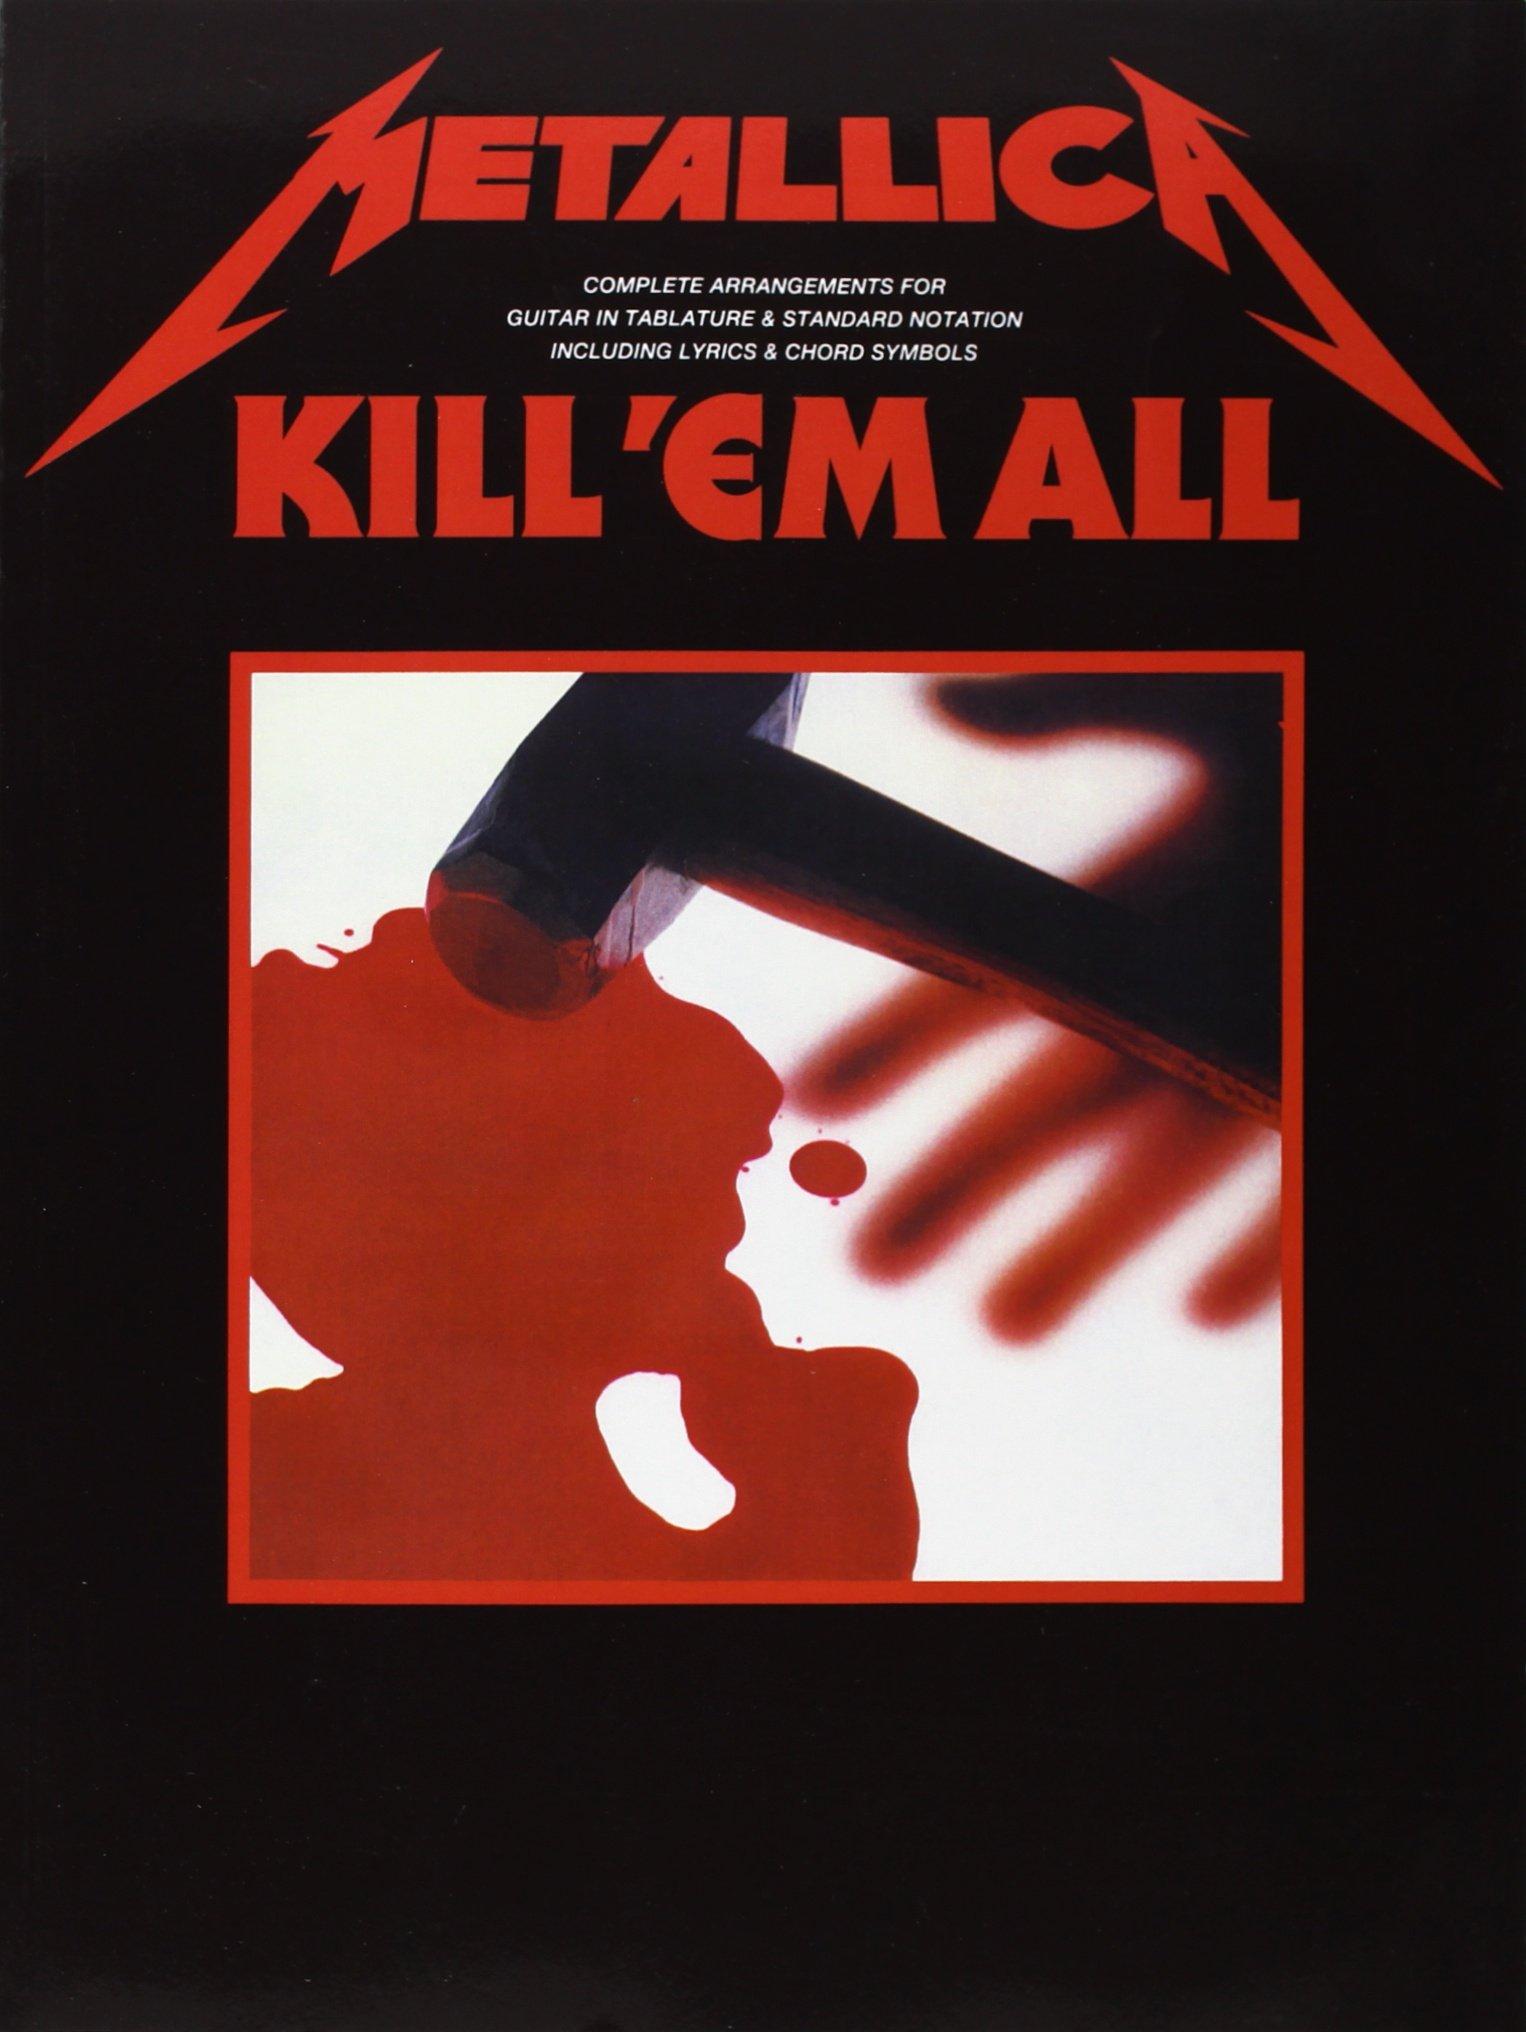 Metallica: Kill 'Em All Guitar Tab Edition (Inglés) Tapa blanda – 1 ene 2000 Metallica (Artist) Music Sales Ltd 0711947090 16639141